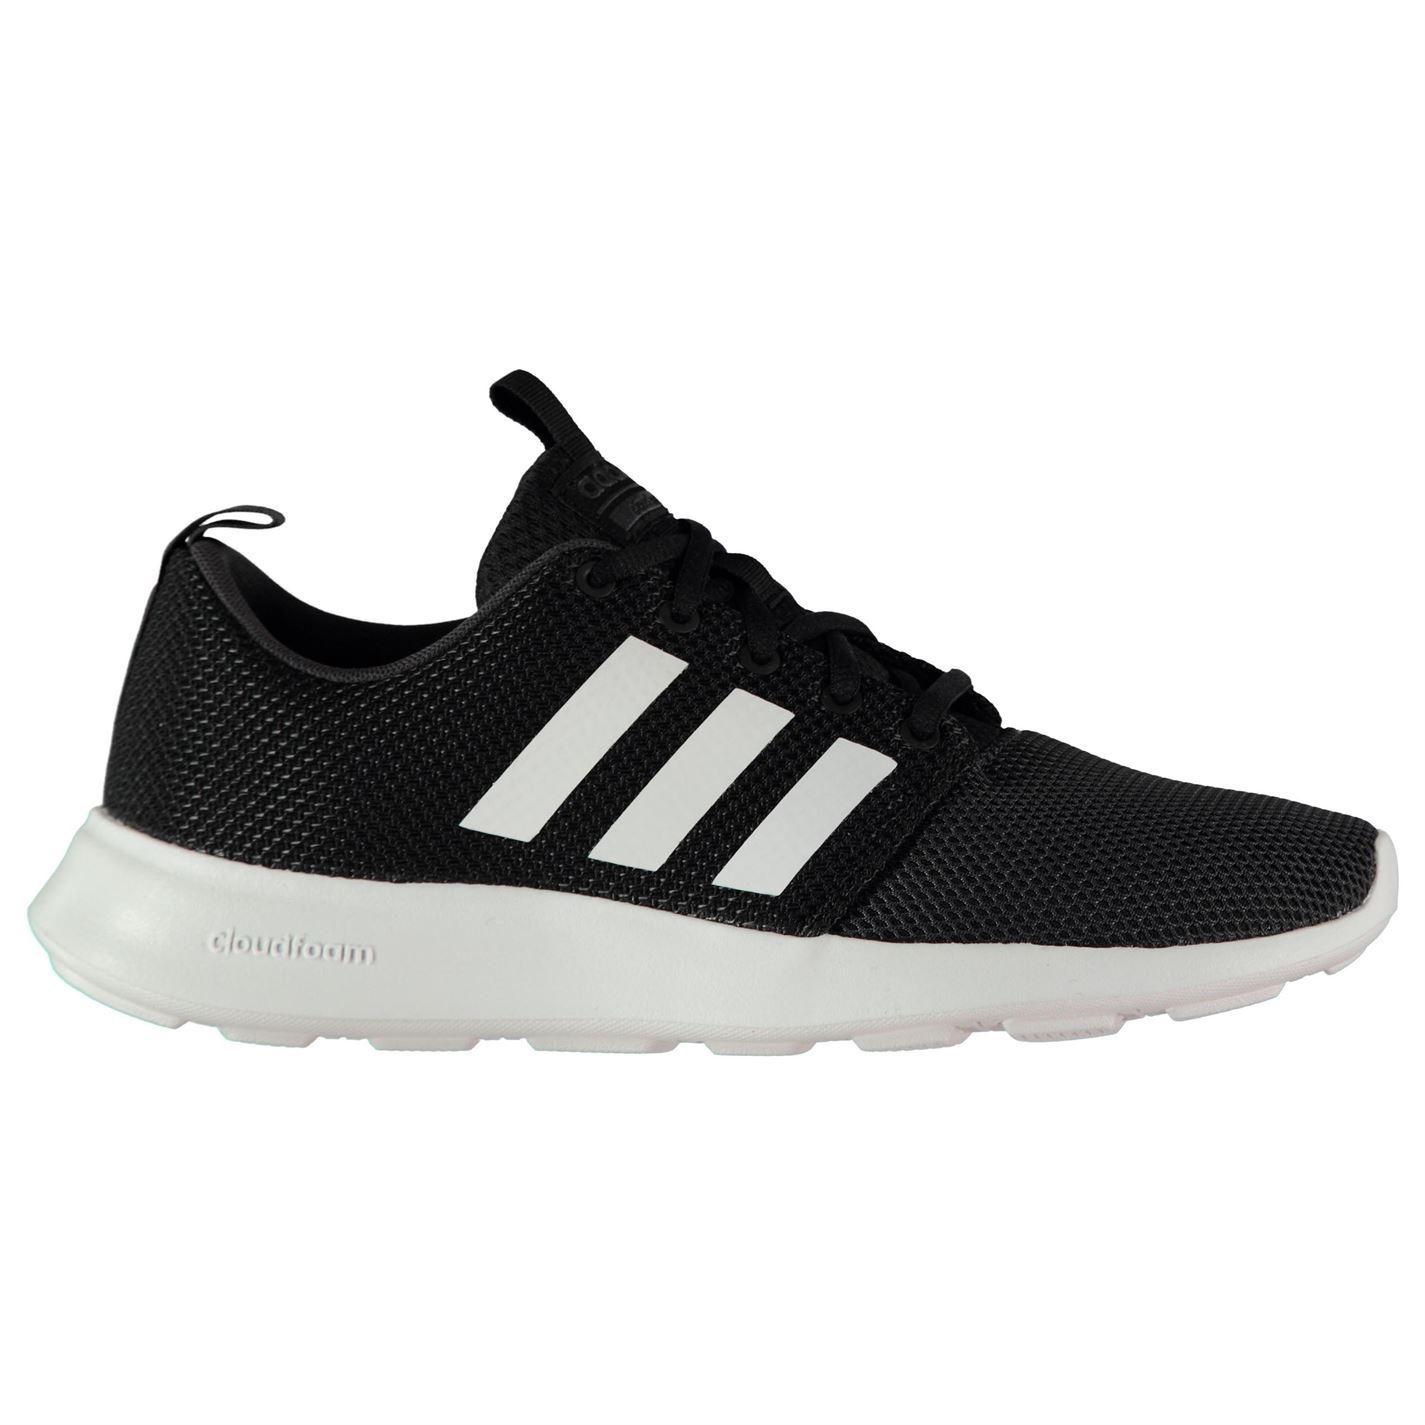 Adidas cloudfoam swift formatori Uomo nero / bianco le scarpe sportive